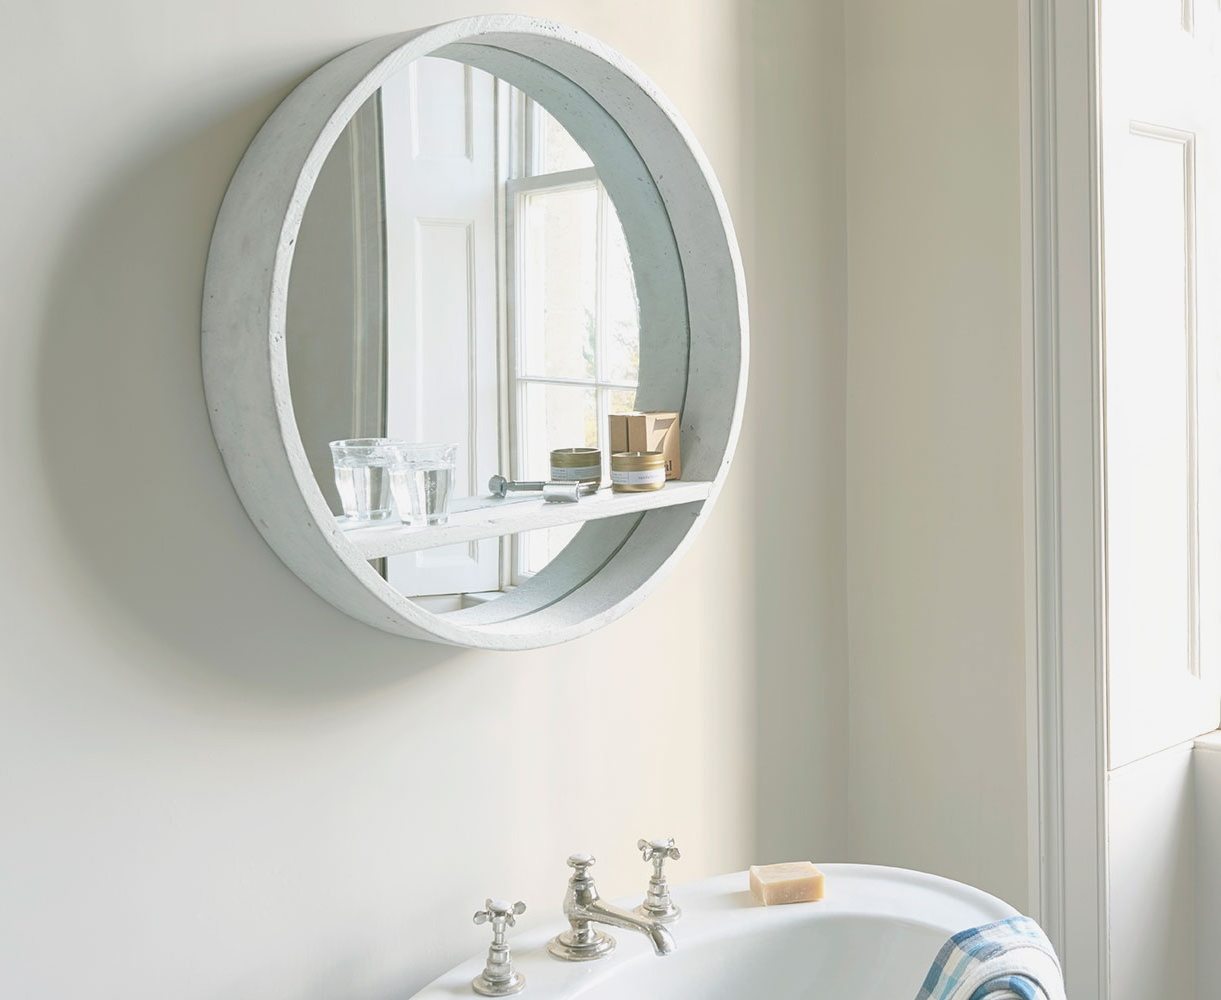 2020 35 Most Divine Big Wall Mirrors Chrome Bathroom Mirror Circle Light Inside Chrome Wall Mirrors (View 15 of 20)